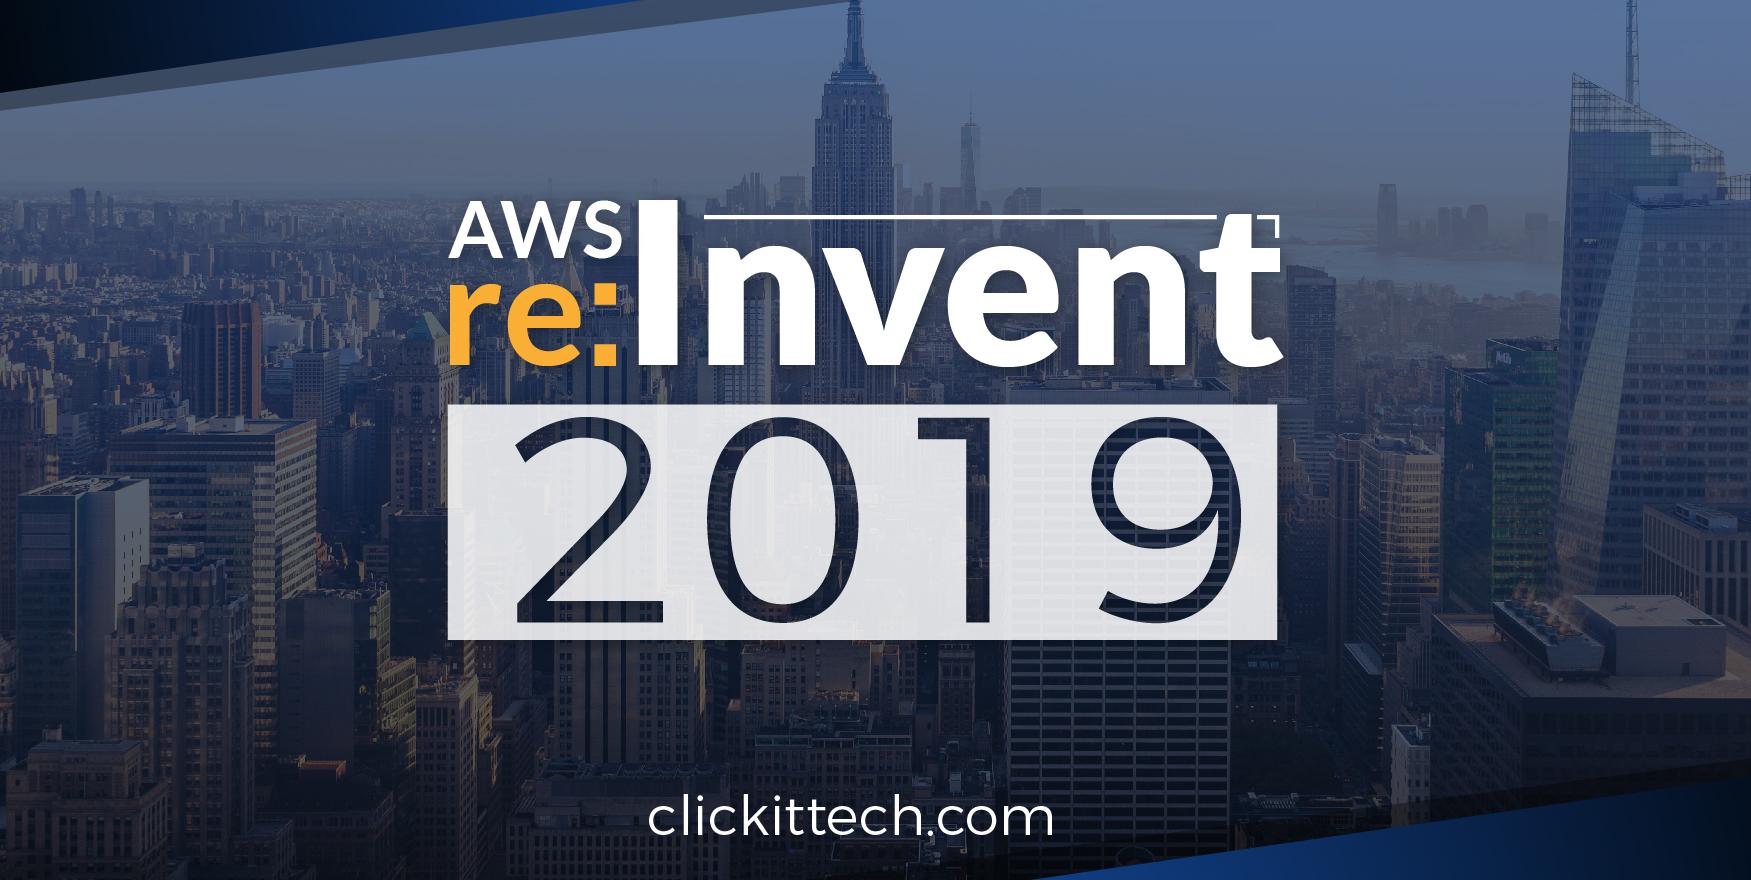 AWS reinvent 2019